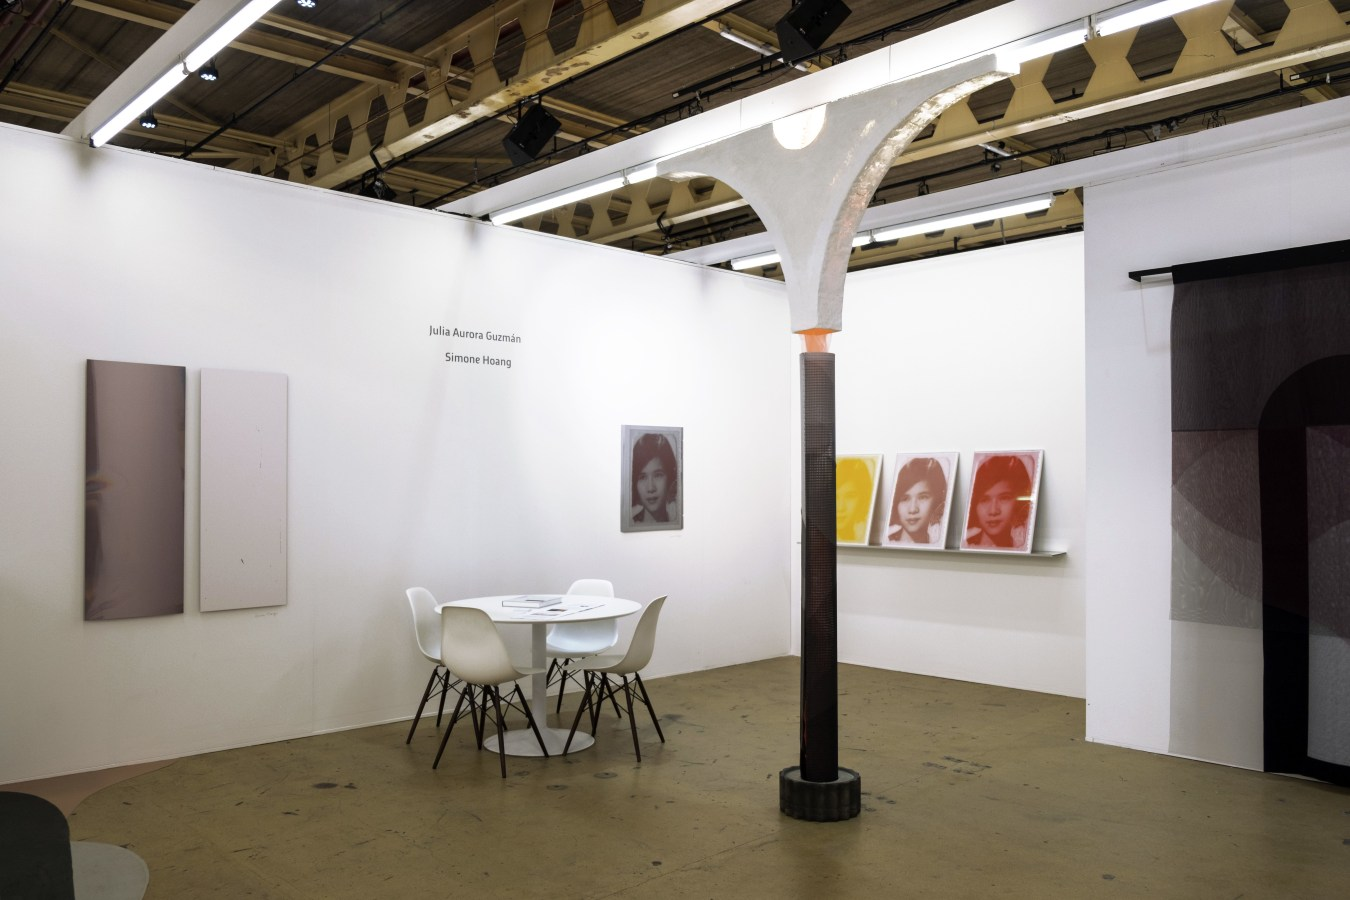 Art Rotterdam Van Nelle 2019, Julia Aurora Guzmán, Simone Hoang,